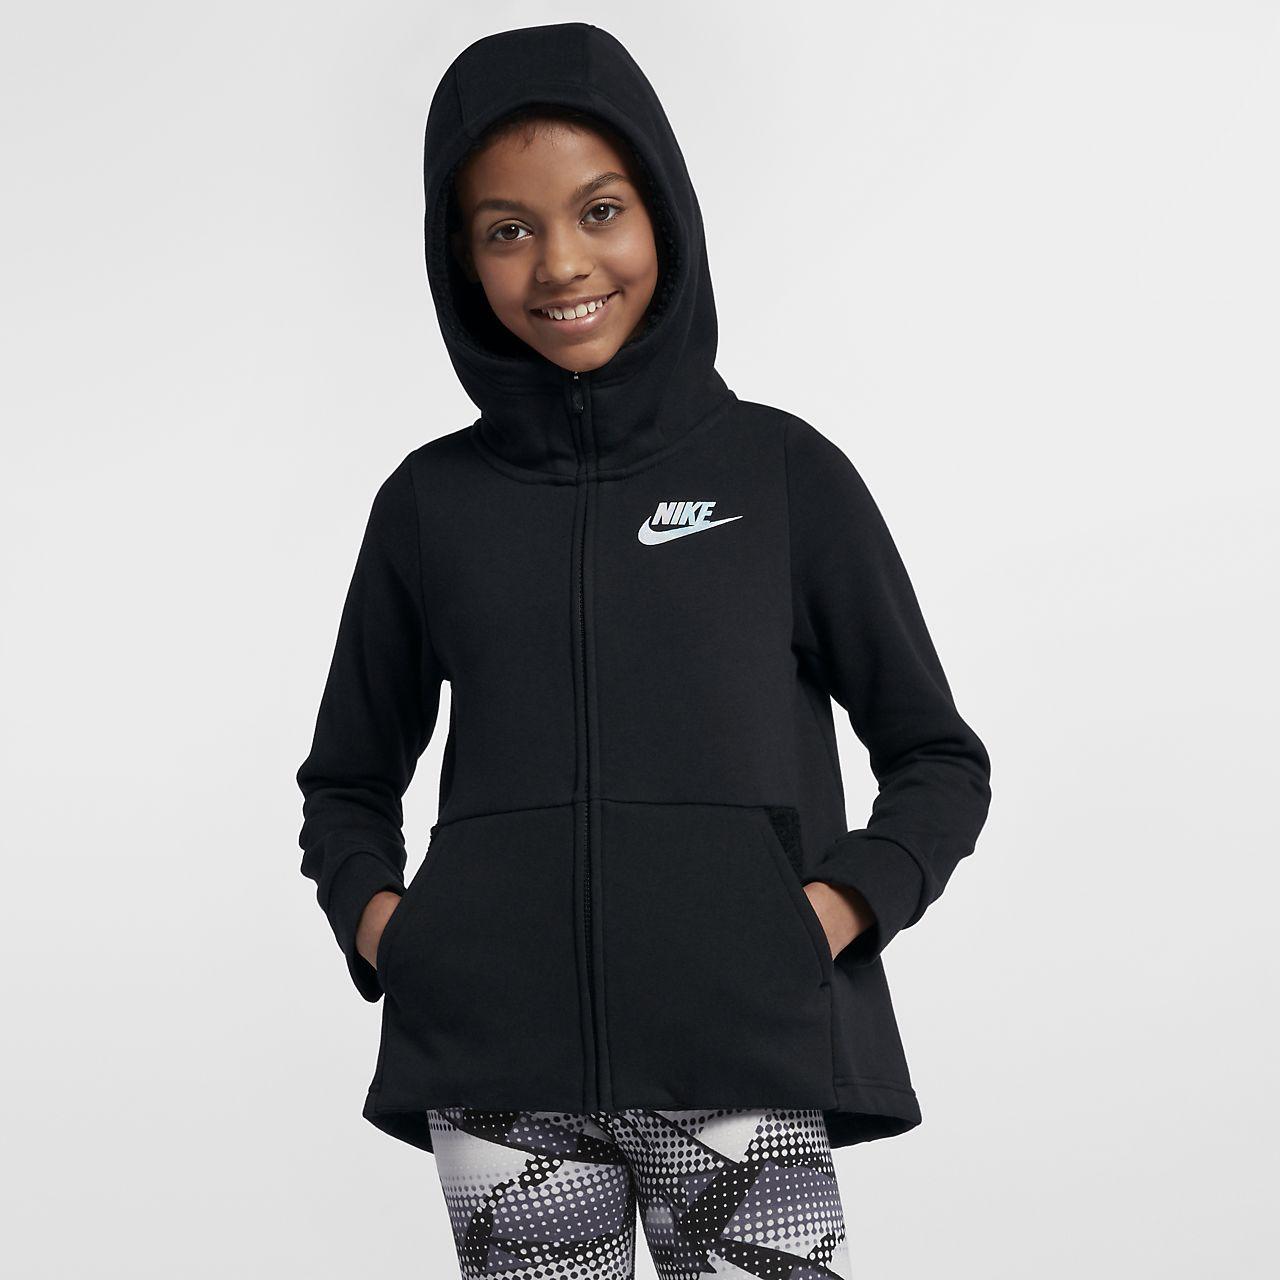 Con Grande Capucha Cierre Para De Nike Completo Niña Sudadera Talla Sportswear qUjVpLGSMz